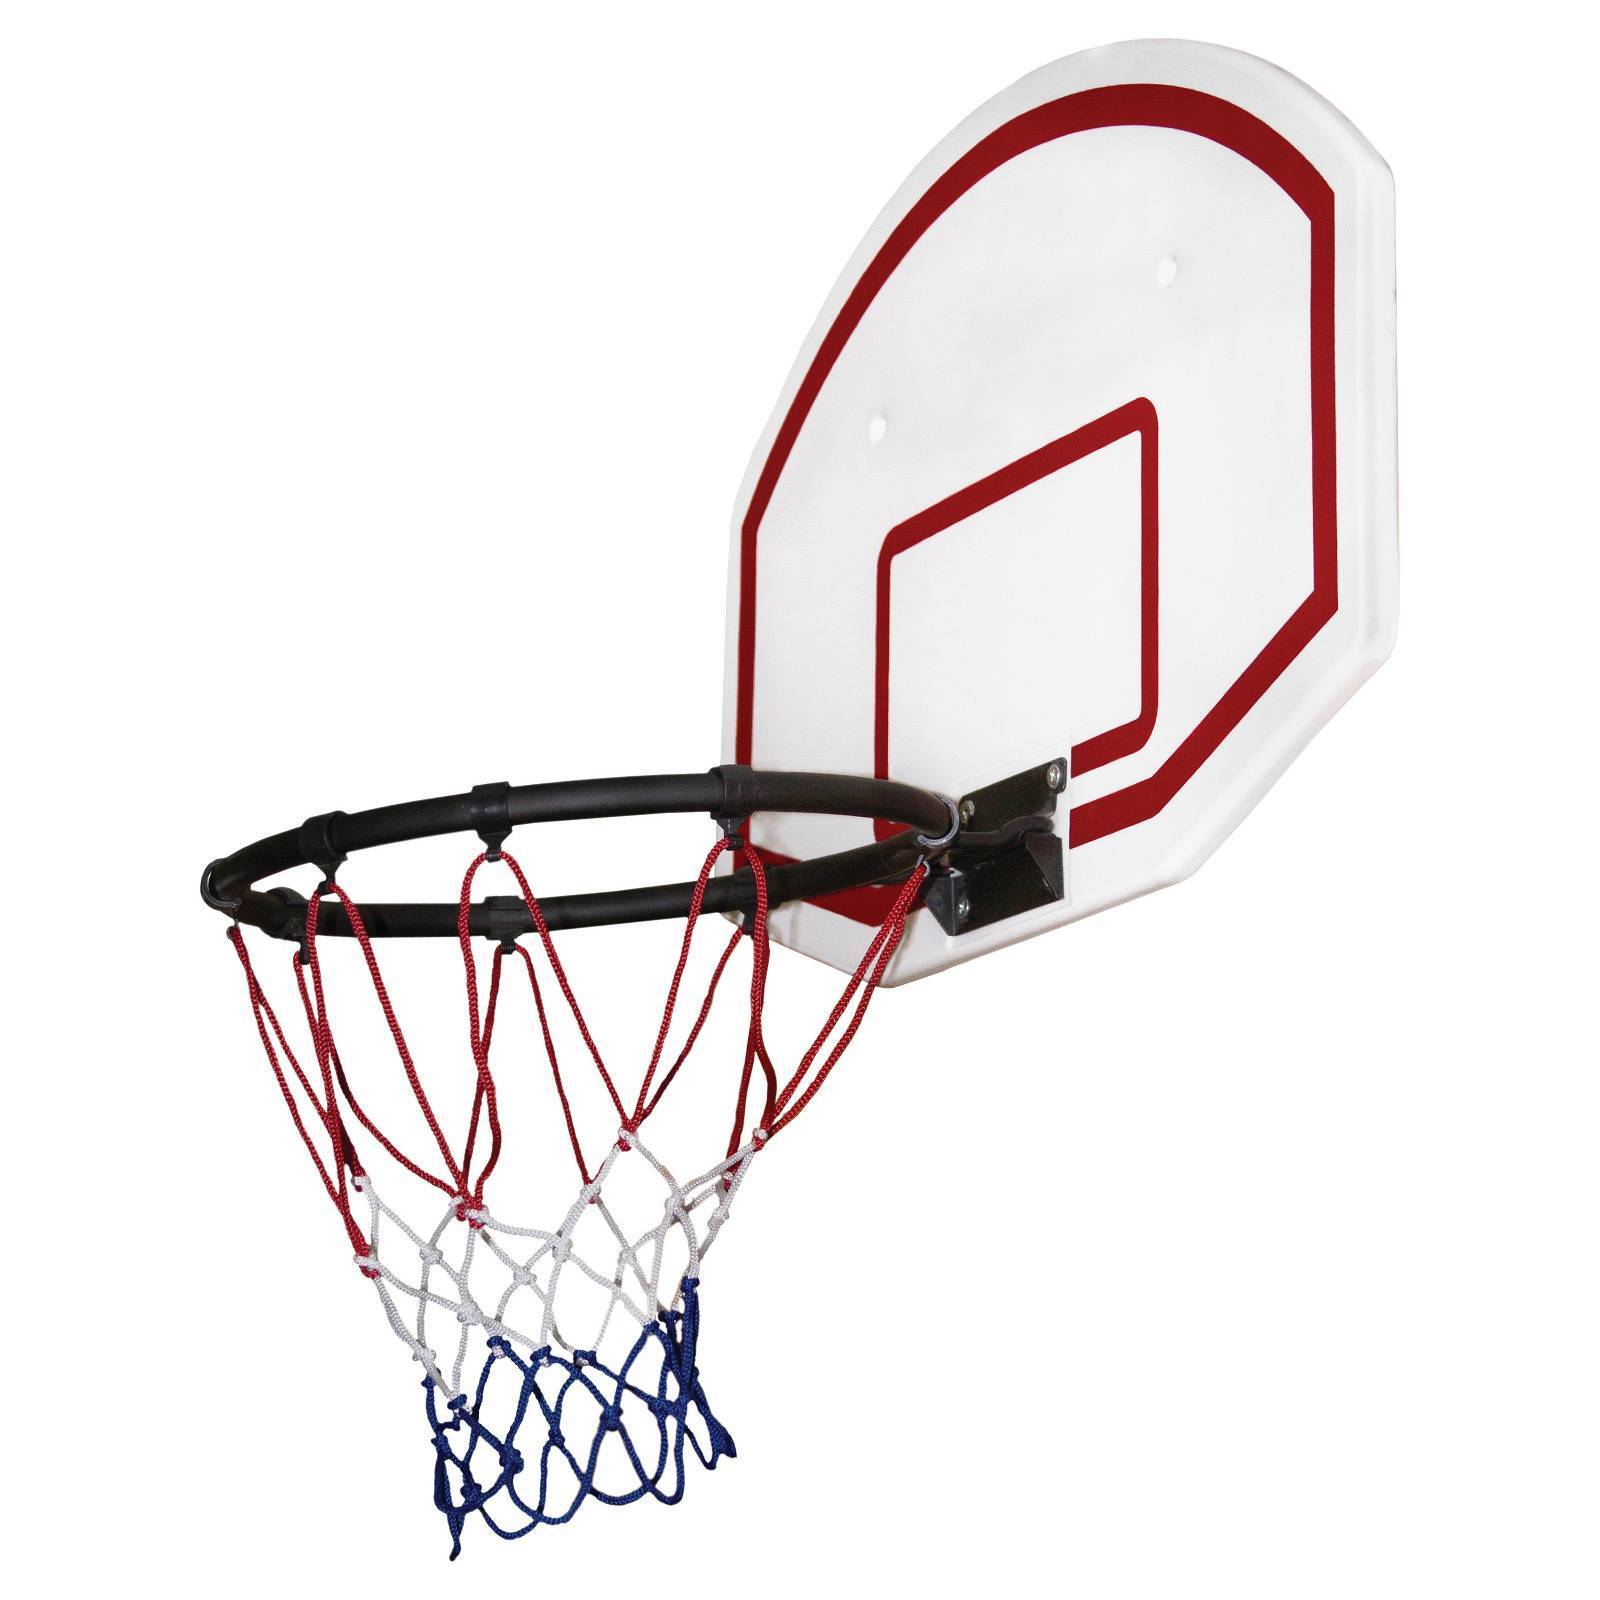 Gorilla Playsets Basketball Hoop Set 12in Rim Mounted Ball Air Pump ... 9a6b2f34bbc